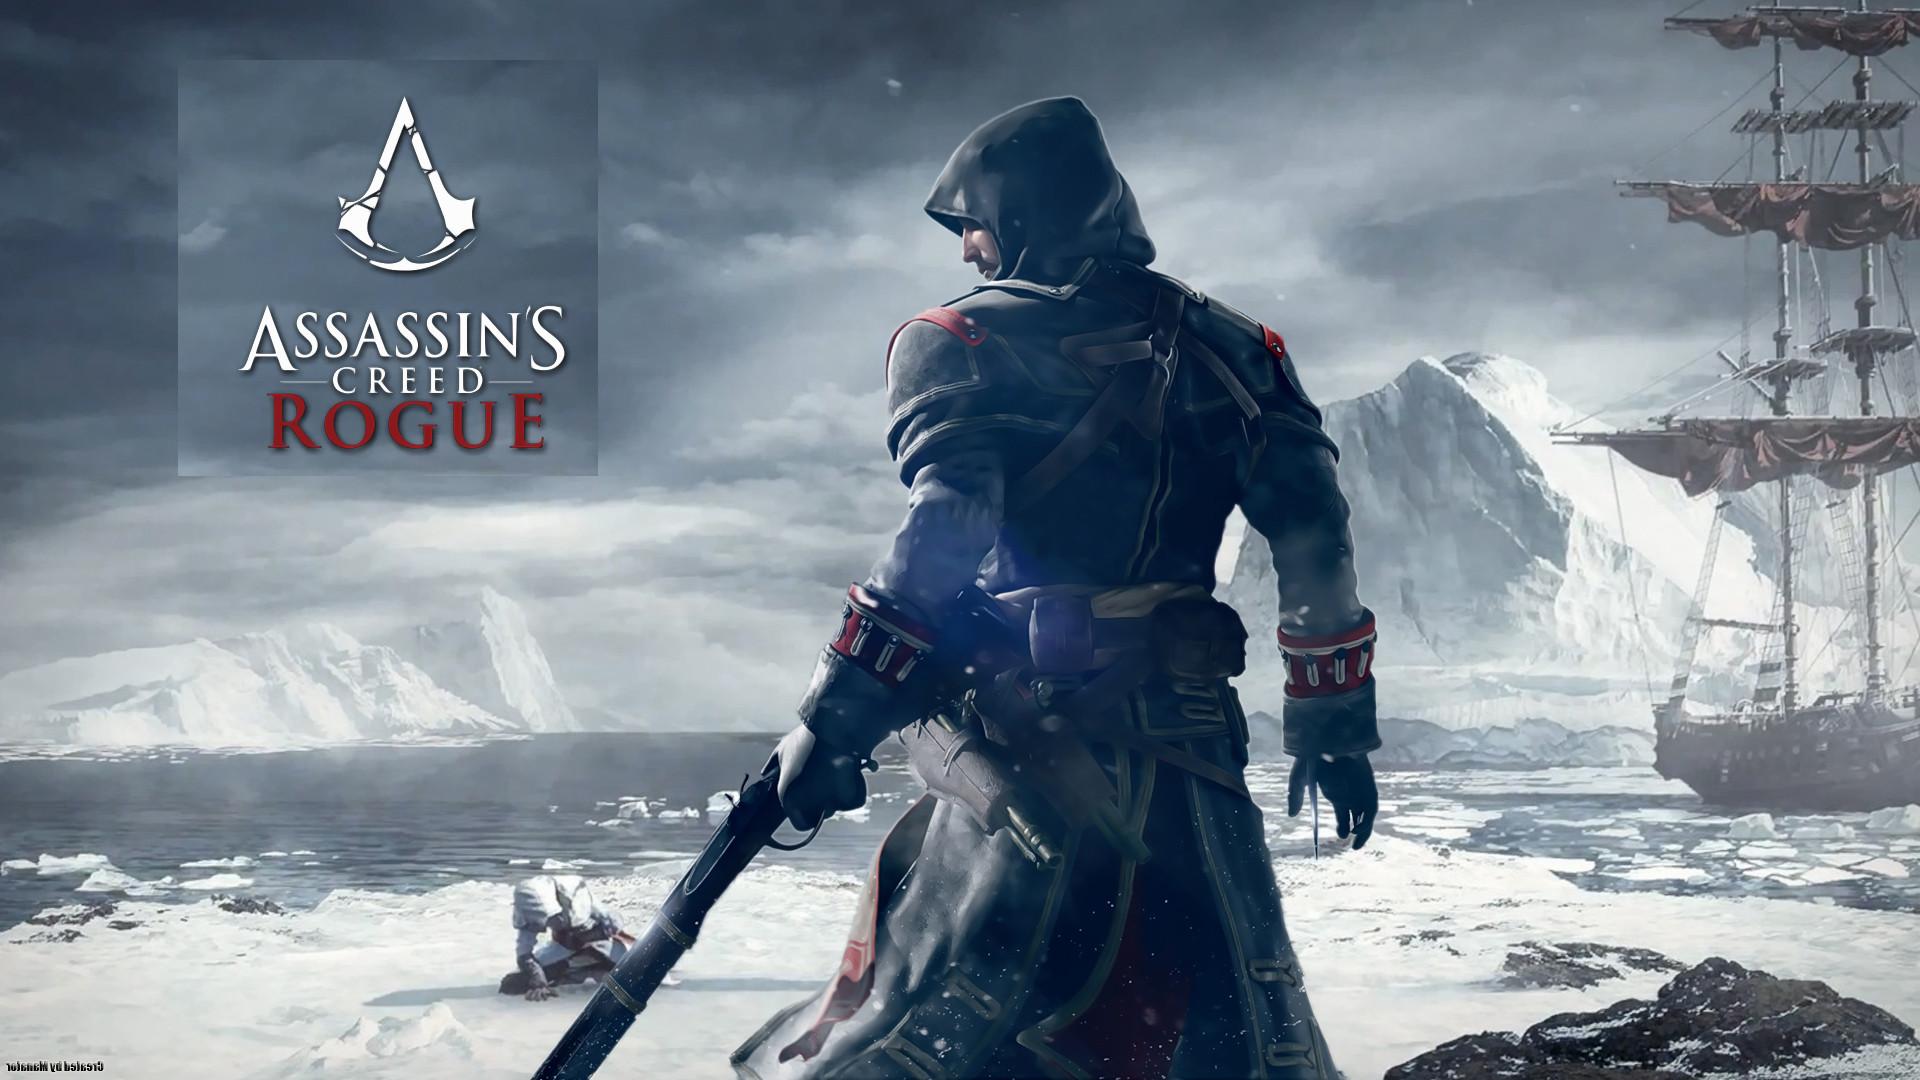 Assassin's Creed Rogue Wallpaper